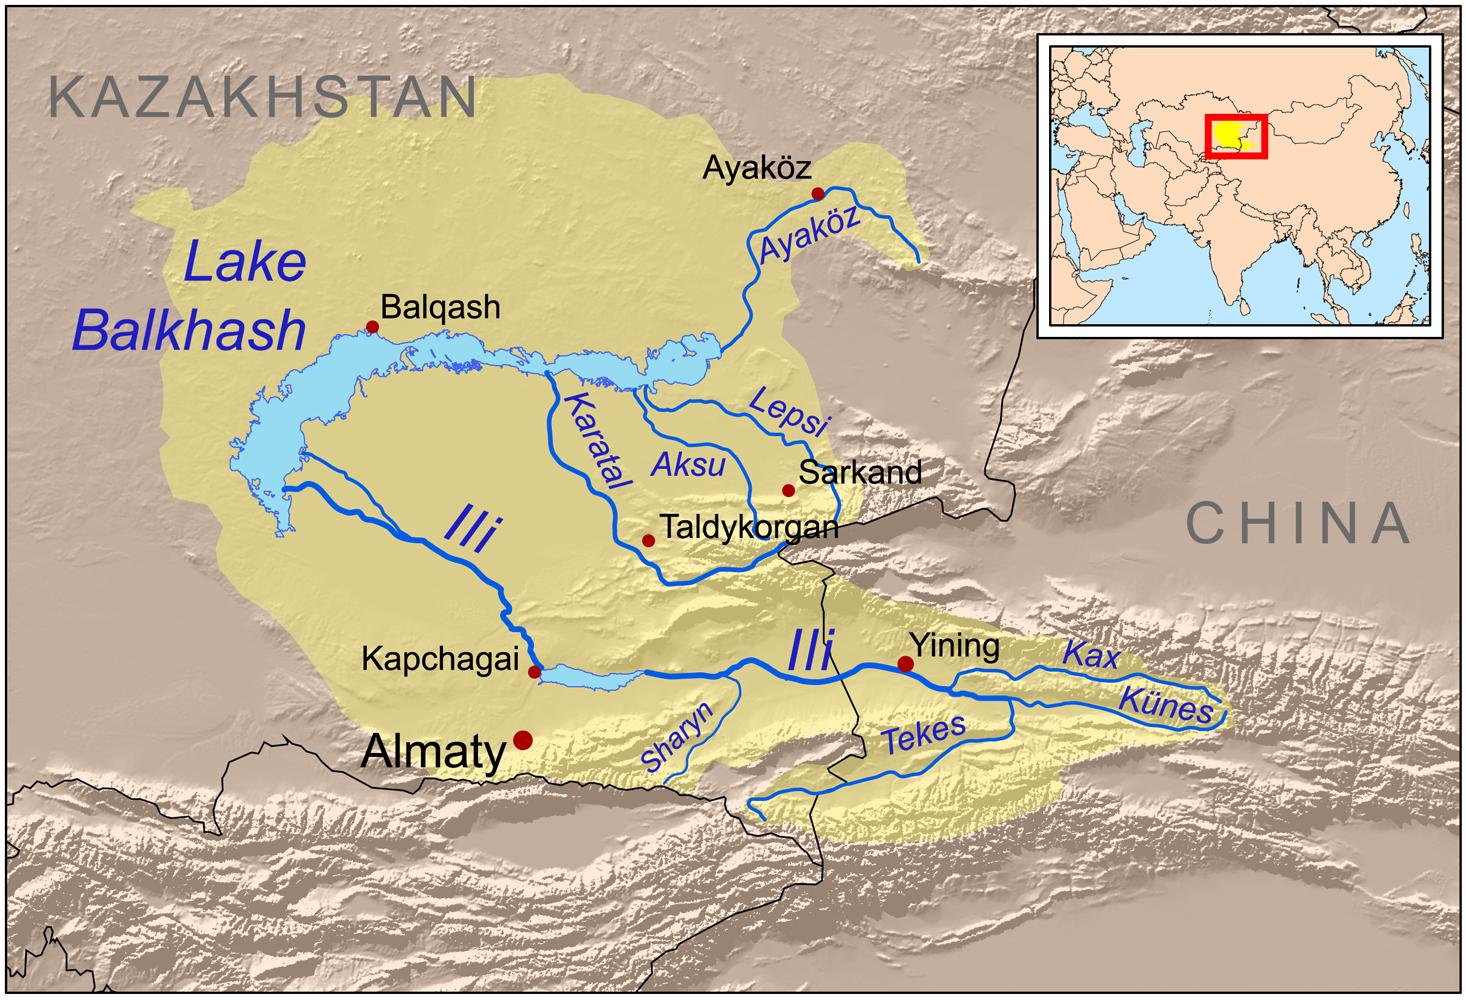 Lakebalkhashbasinmap.png